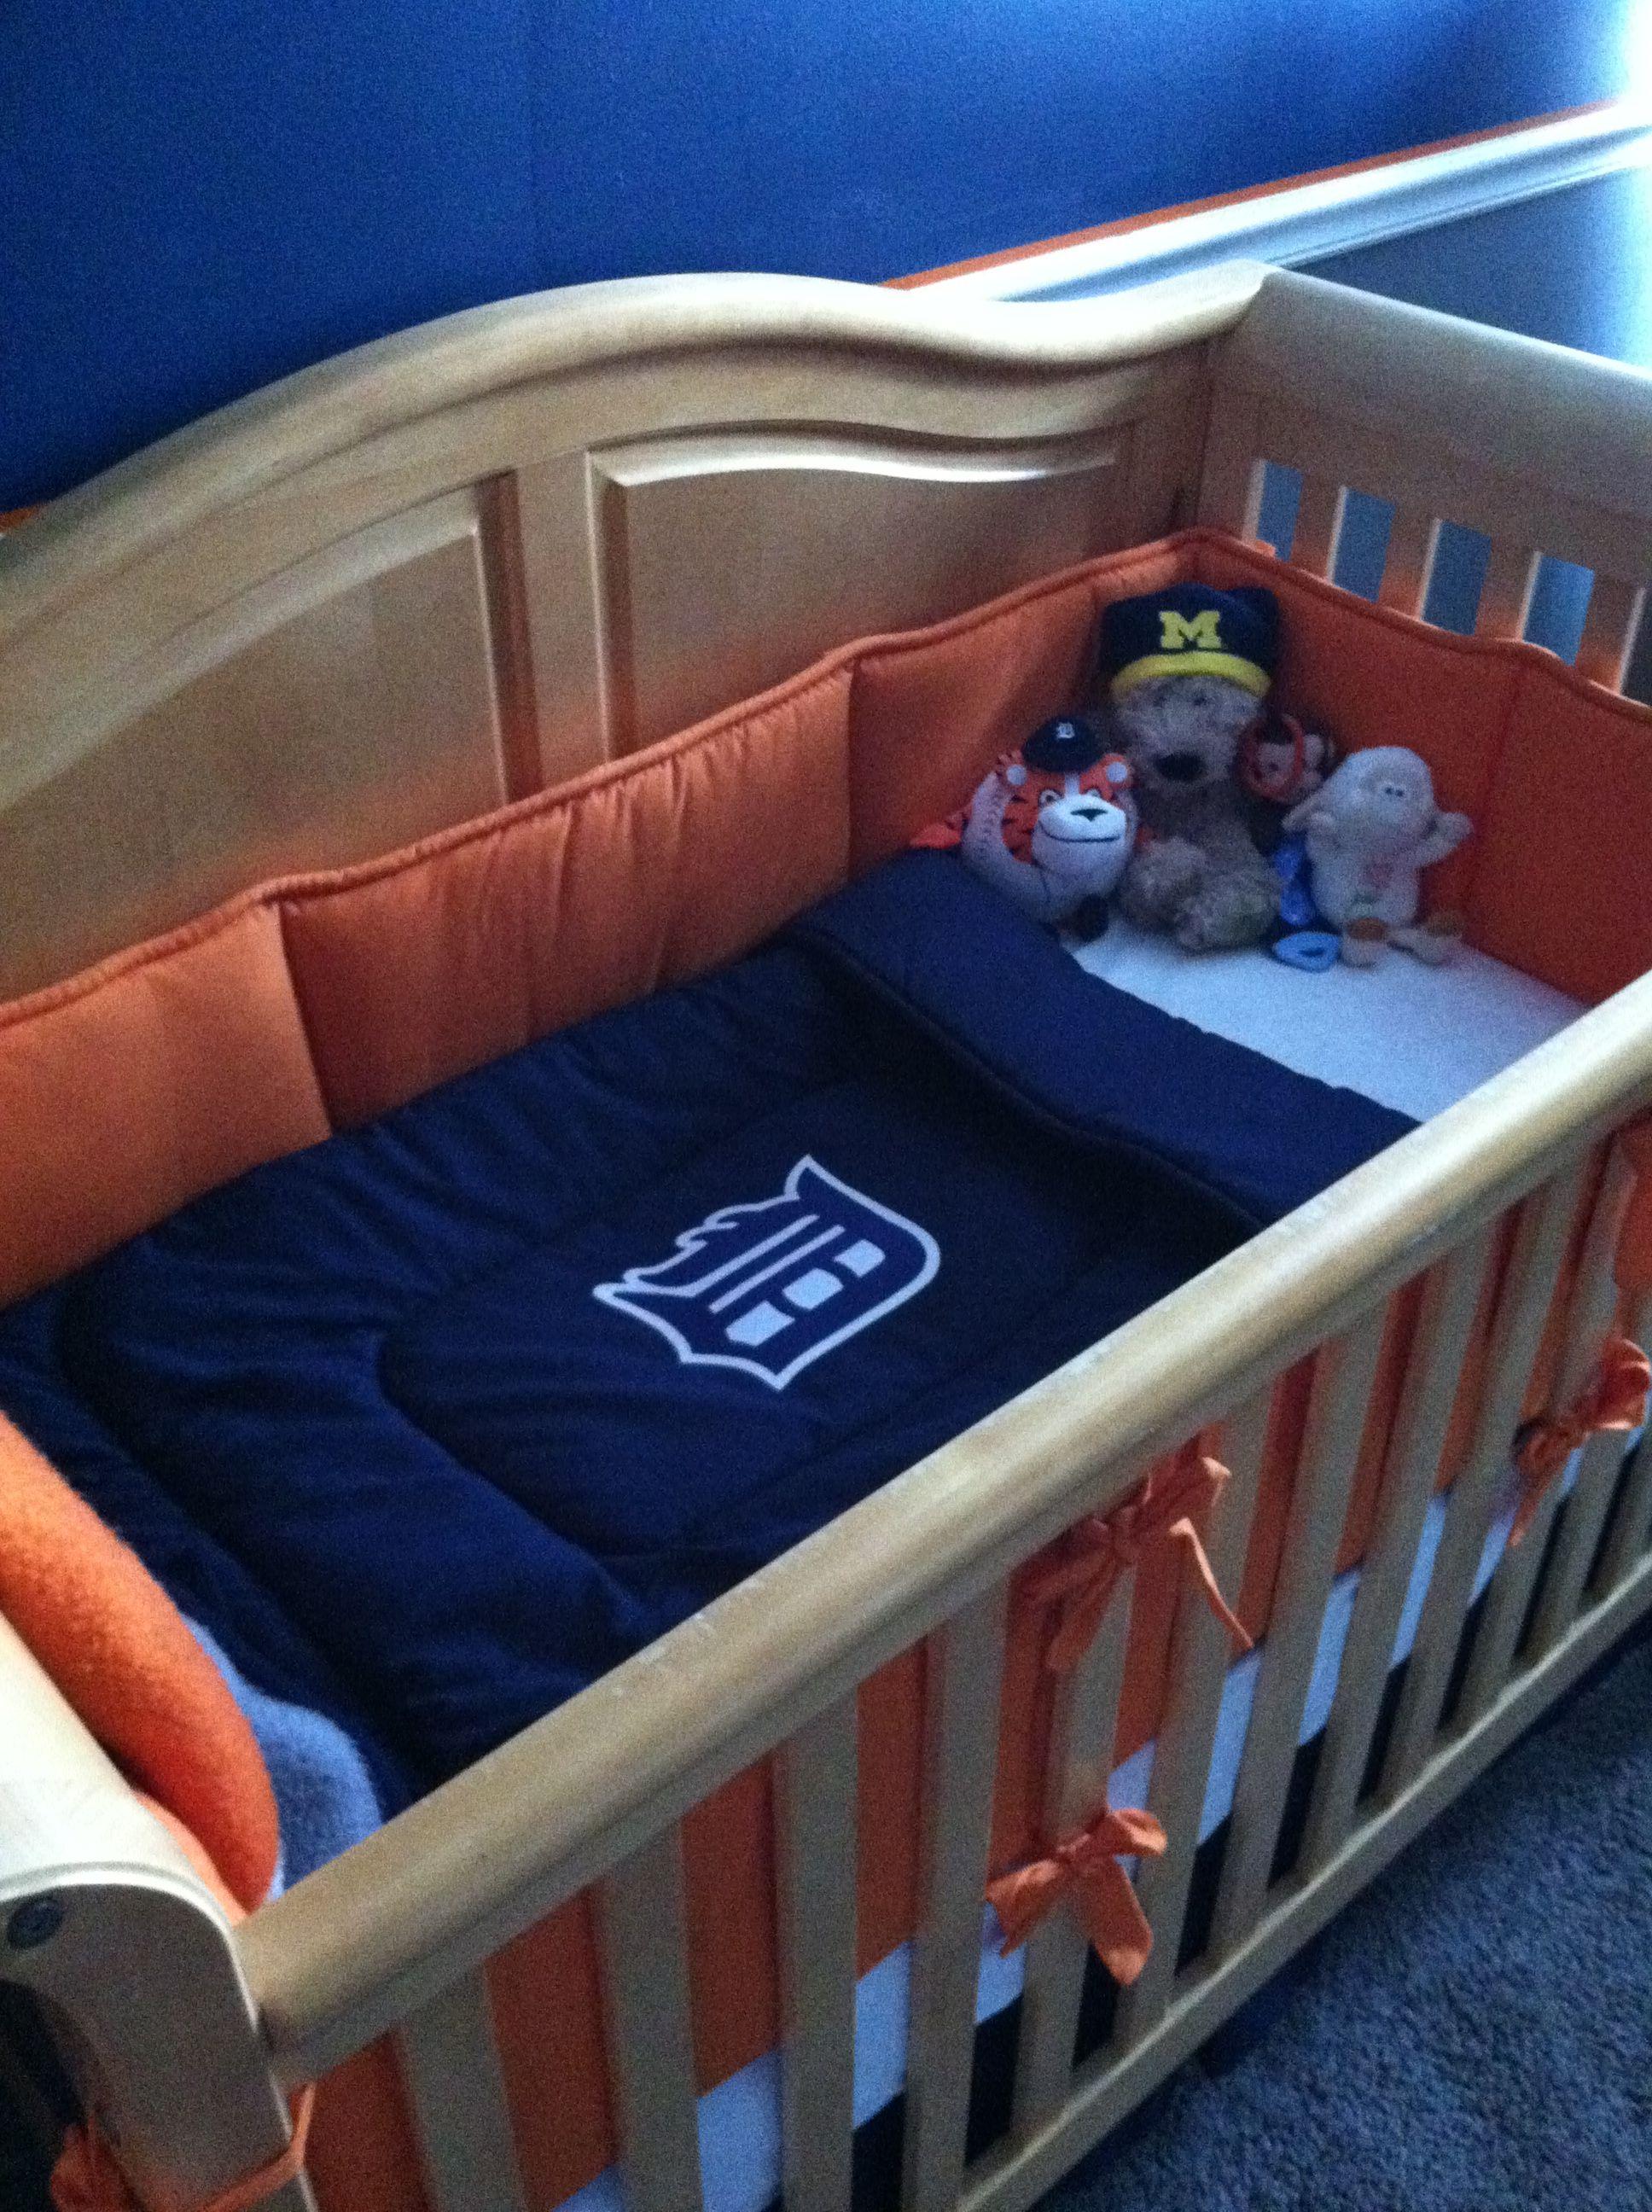 Plain Bedding Set Purchased